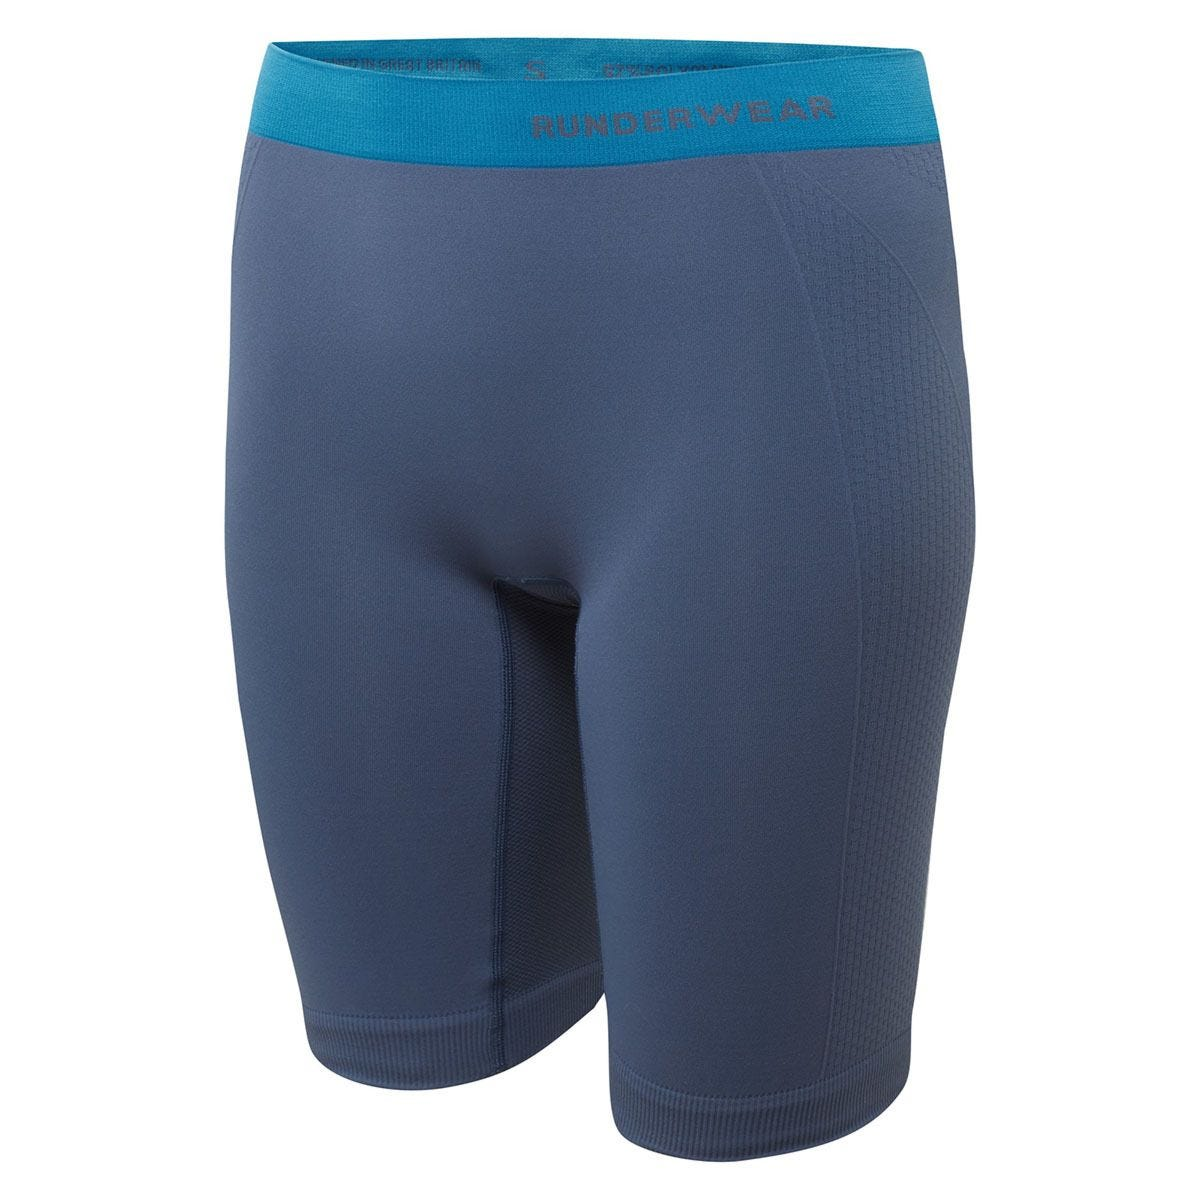 Runderwear Women's Long Shorts Chafe-Free - Blue/Cyan